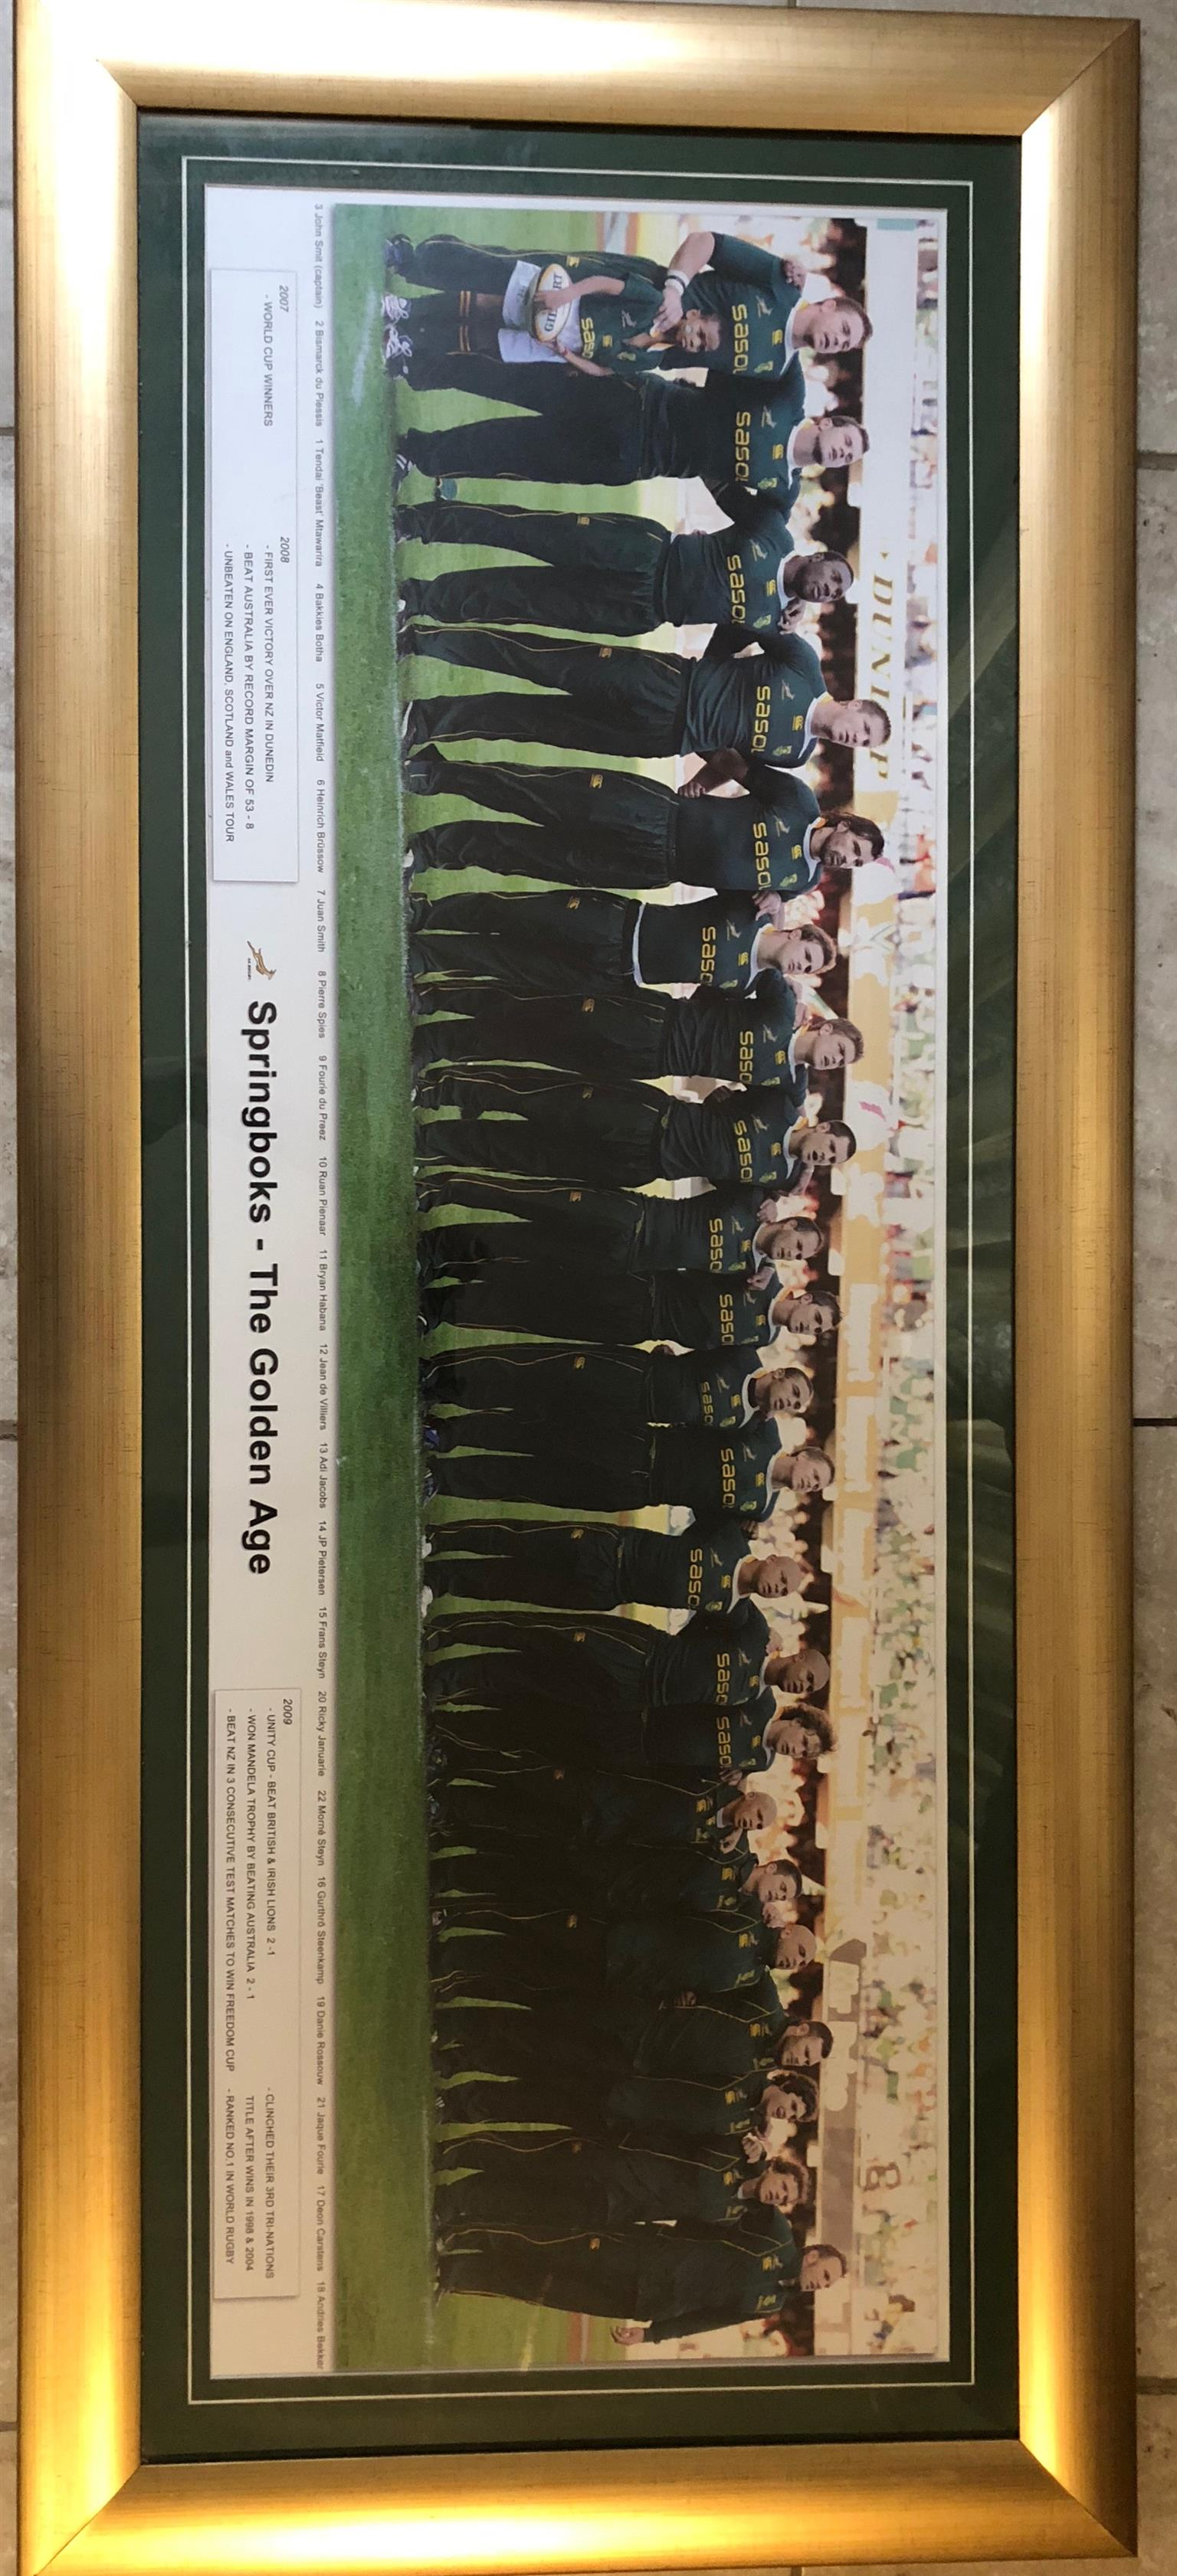 Springbok Team Rugby Memorabilia